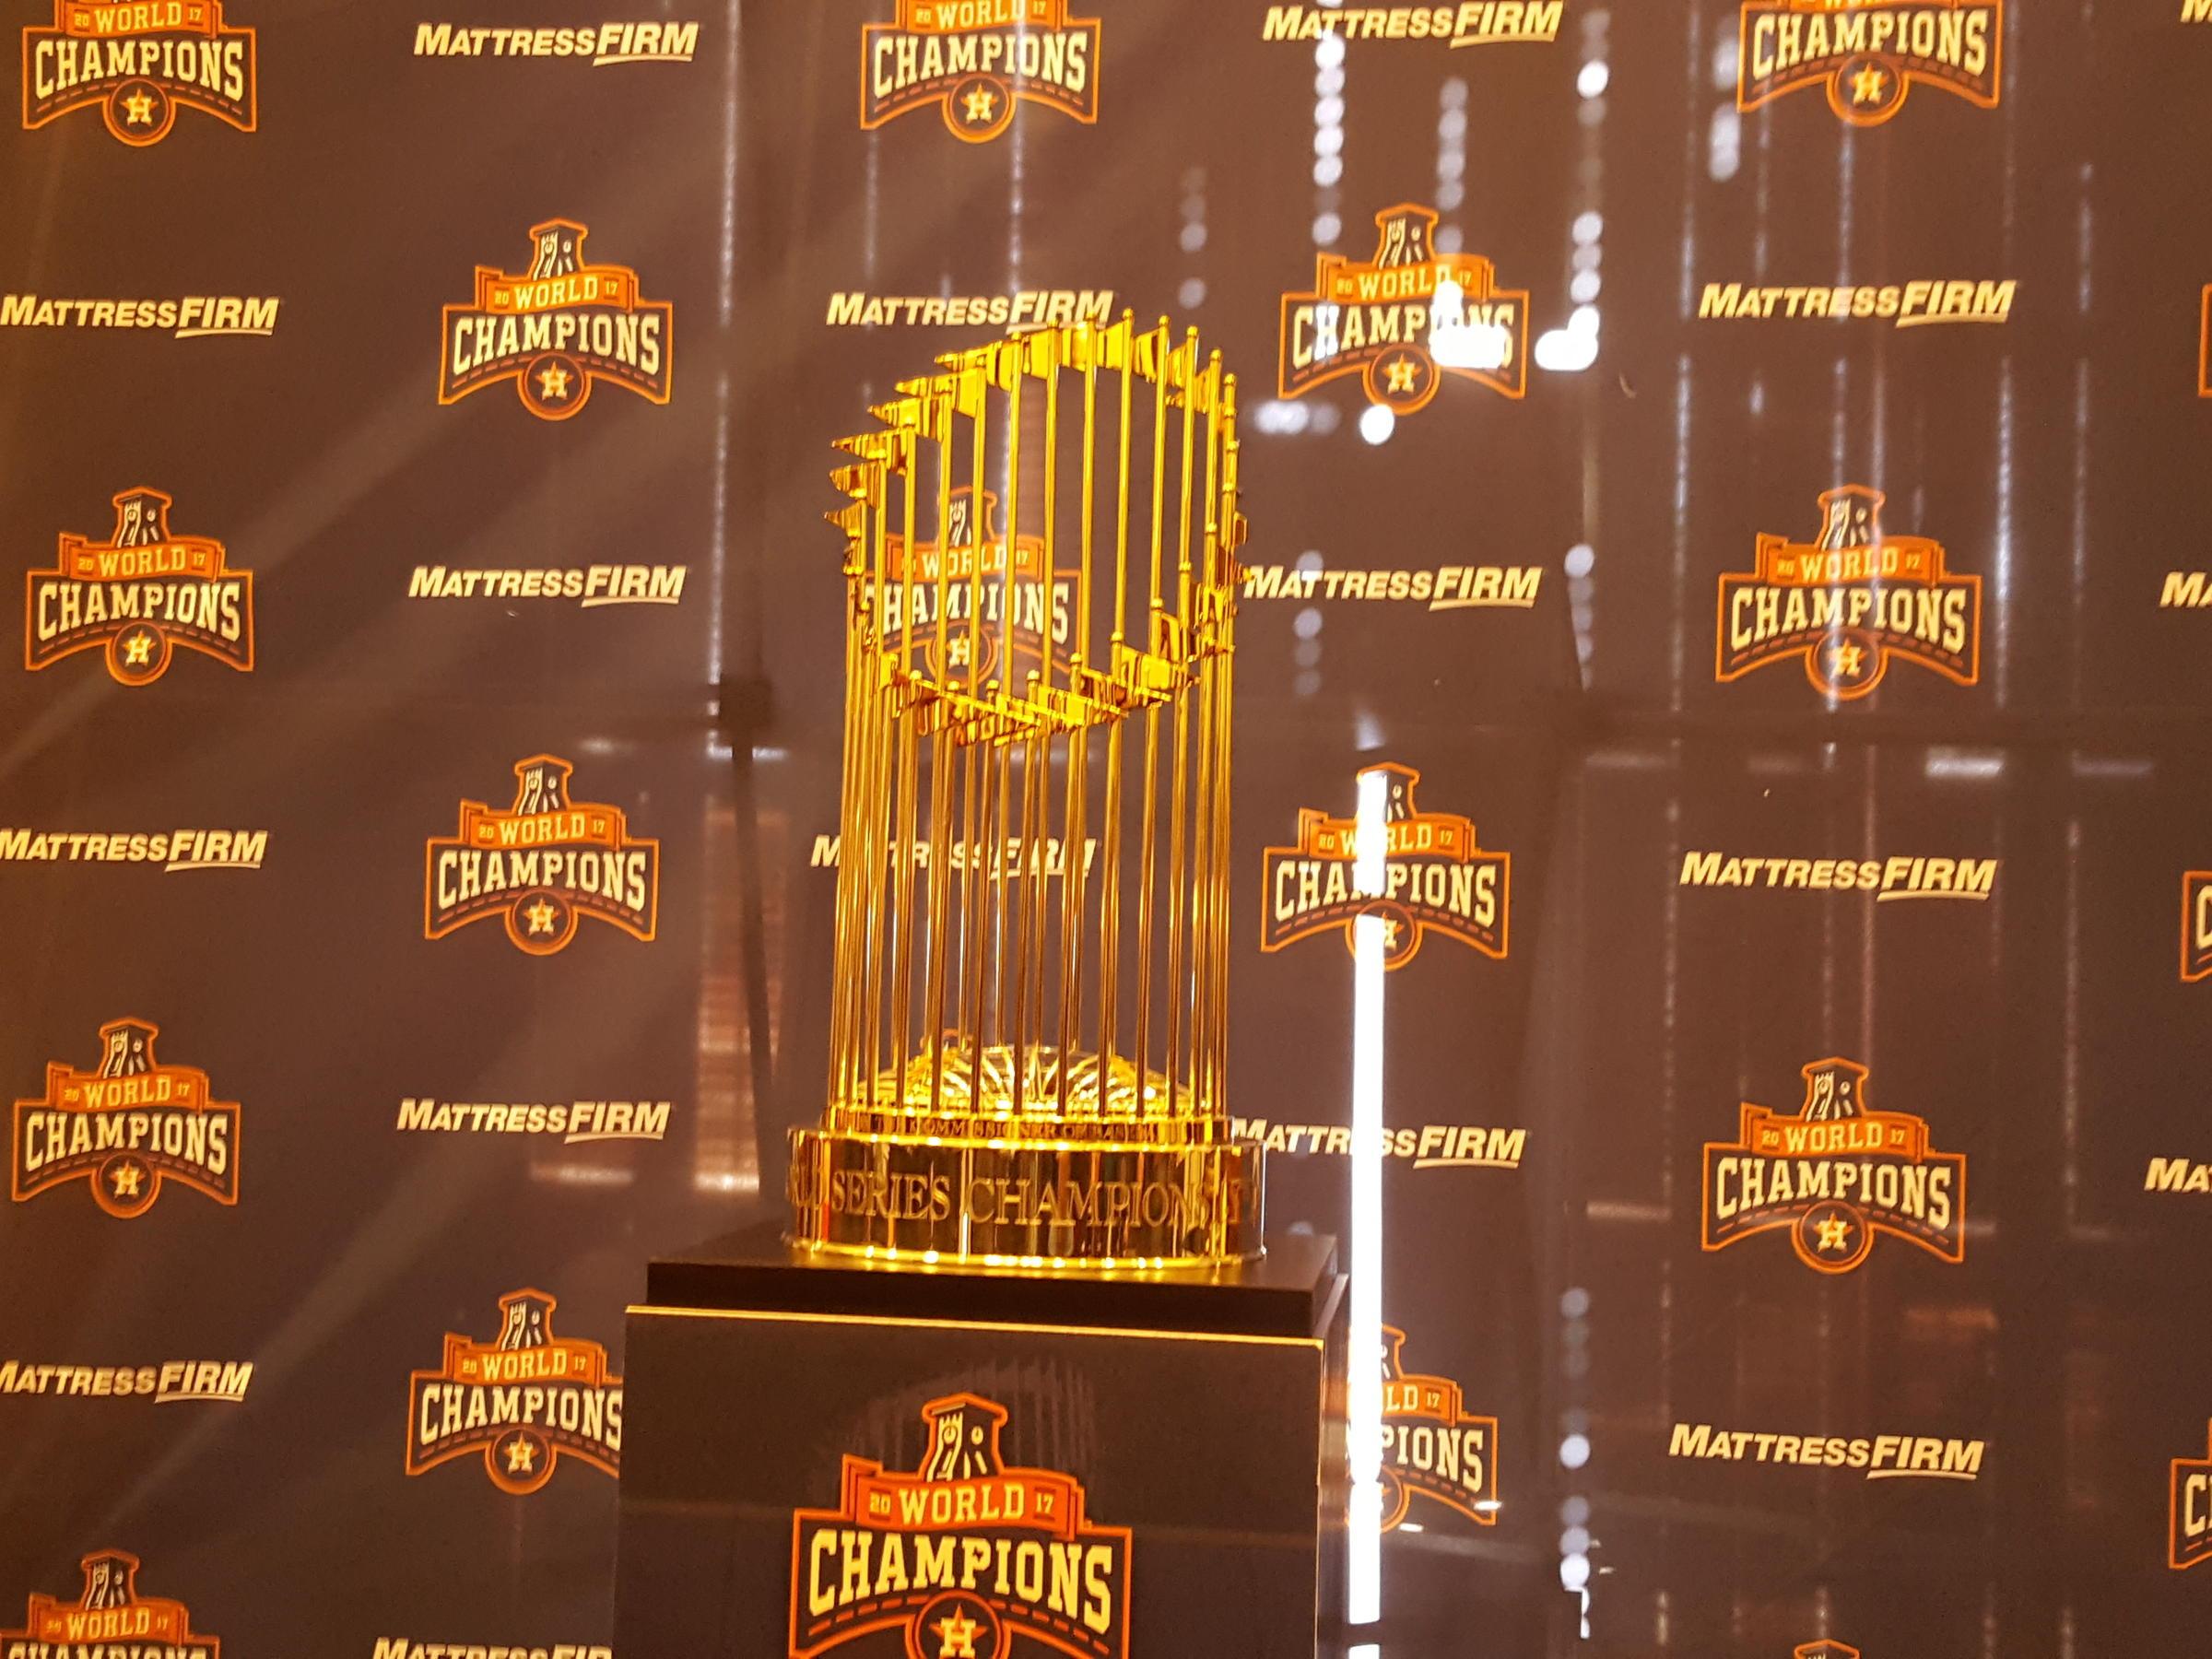 Houston Astros' 2017 World Series Trophy On Tour, Beginning